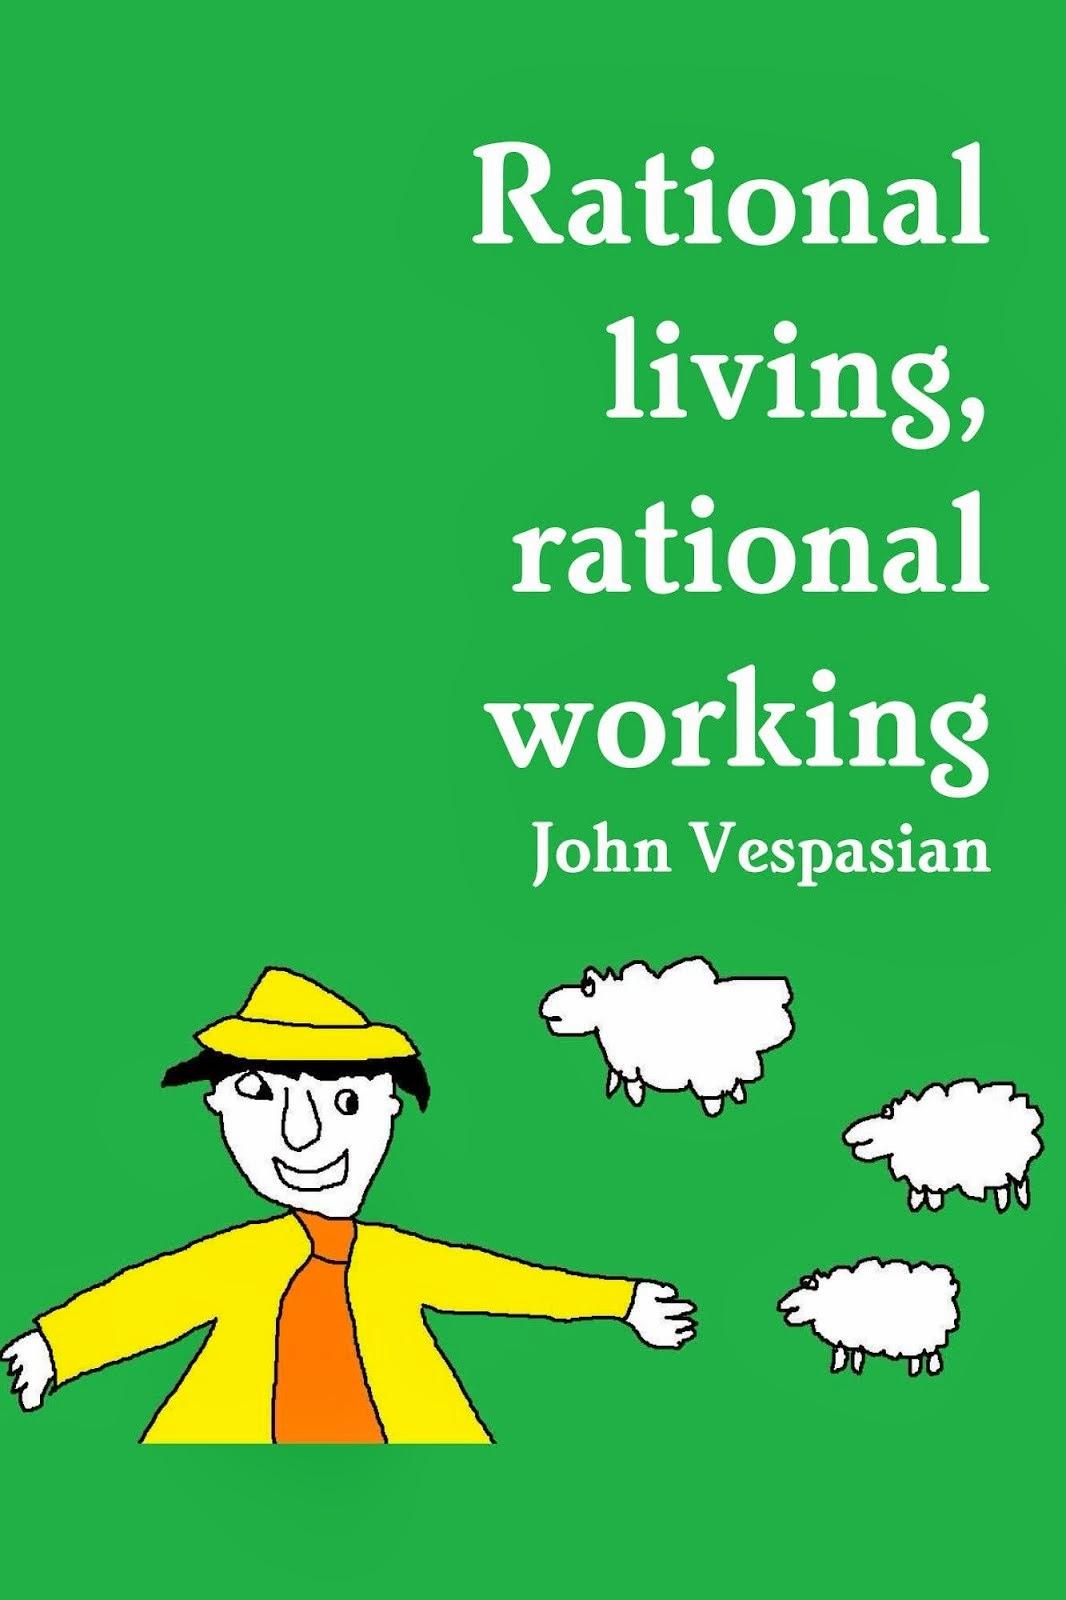 Rational living, rational working